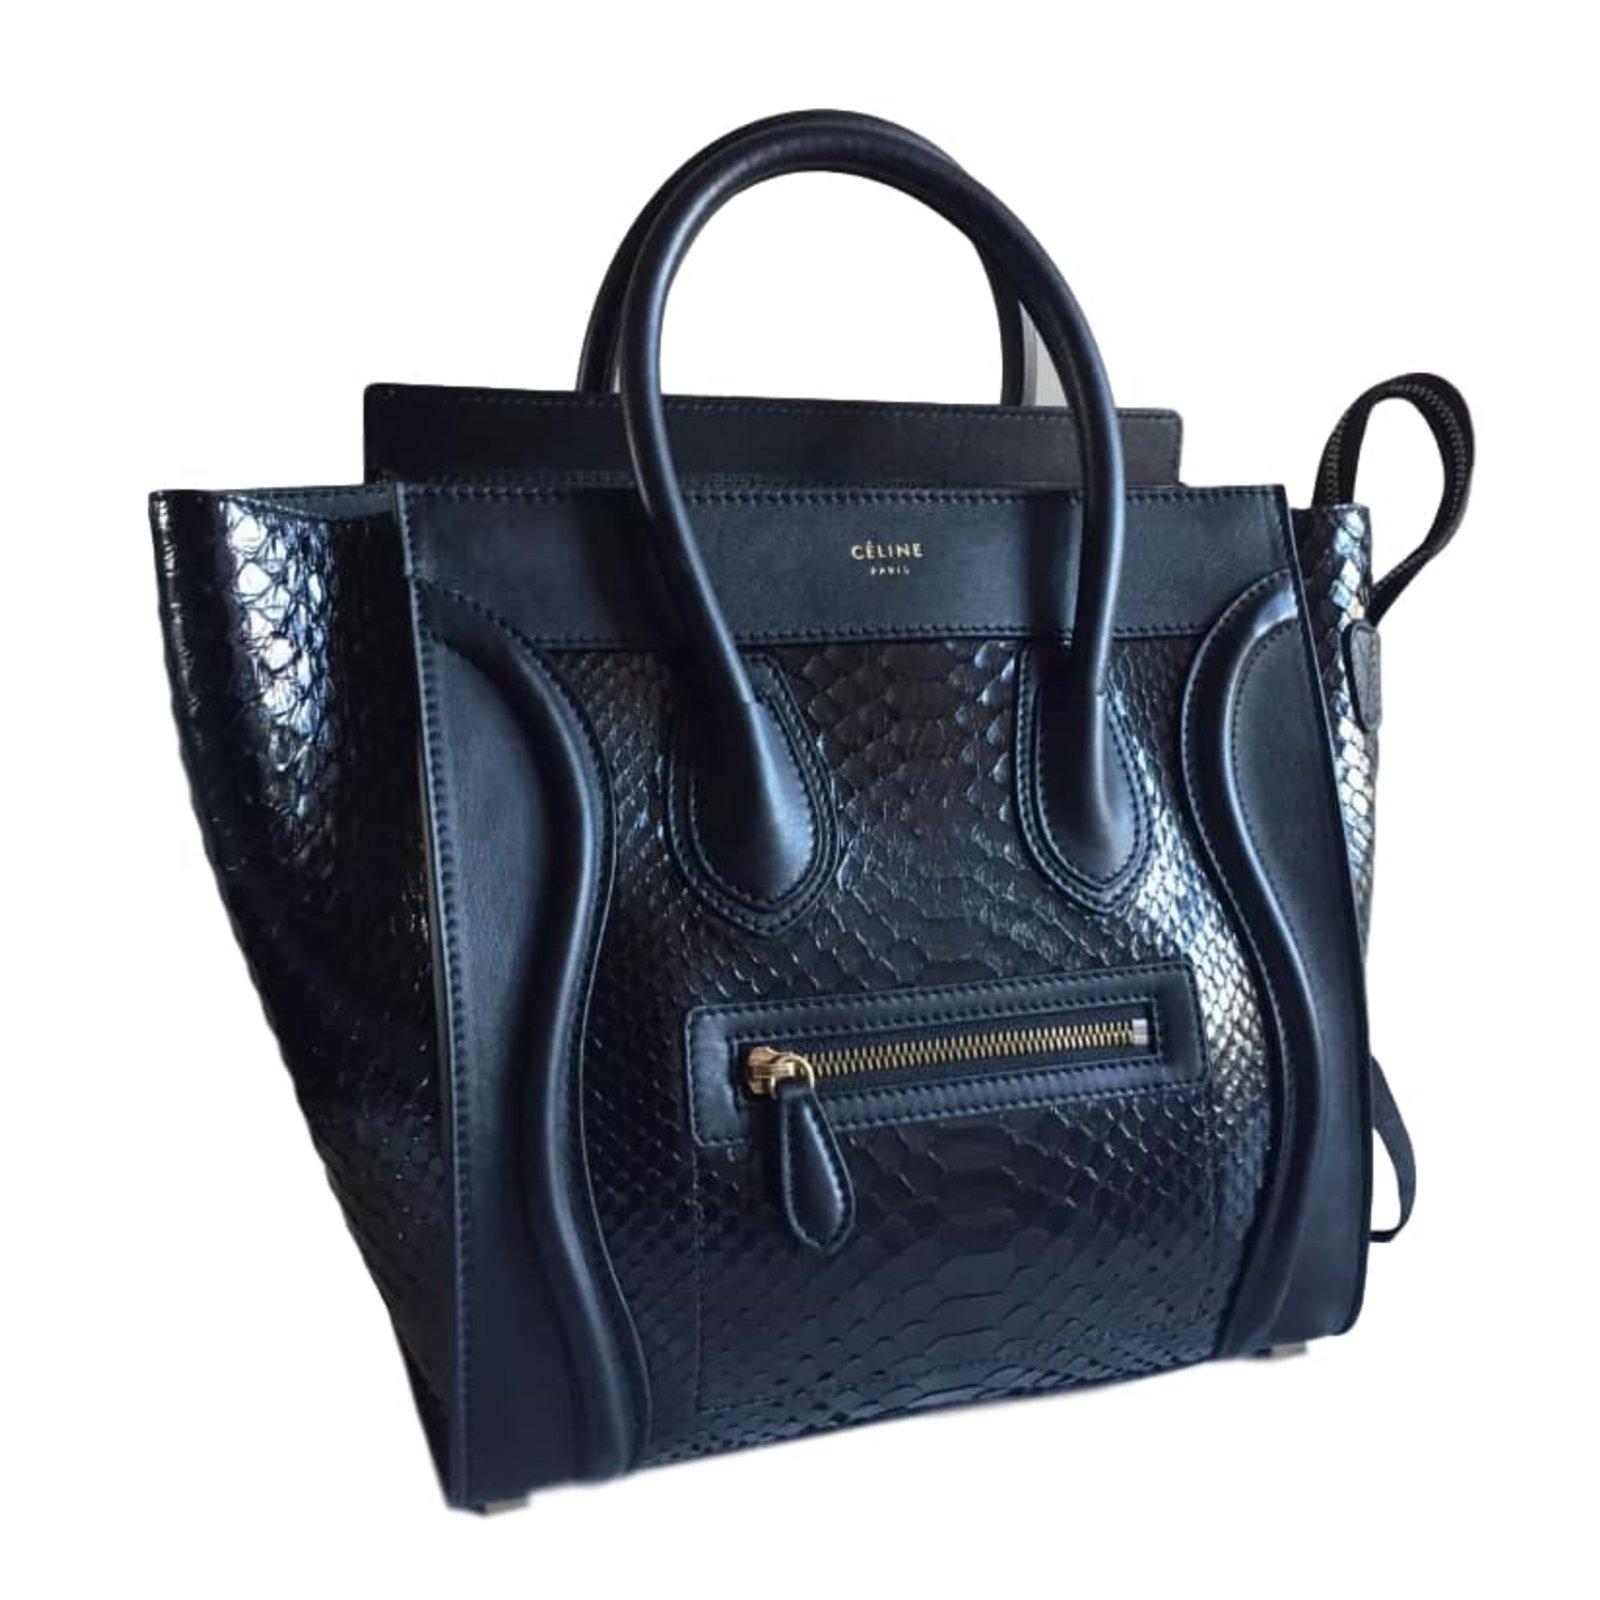 sacs main c line sacs main python noir. Black Bedroom Furniture Sets. Home Design Ideas